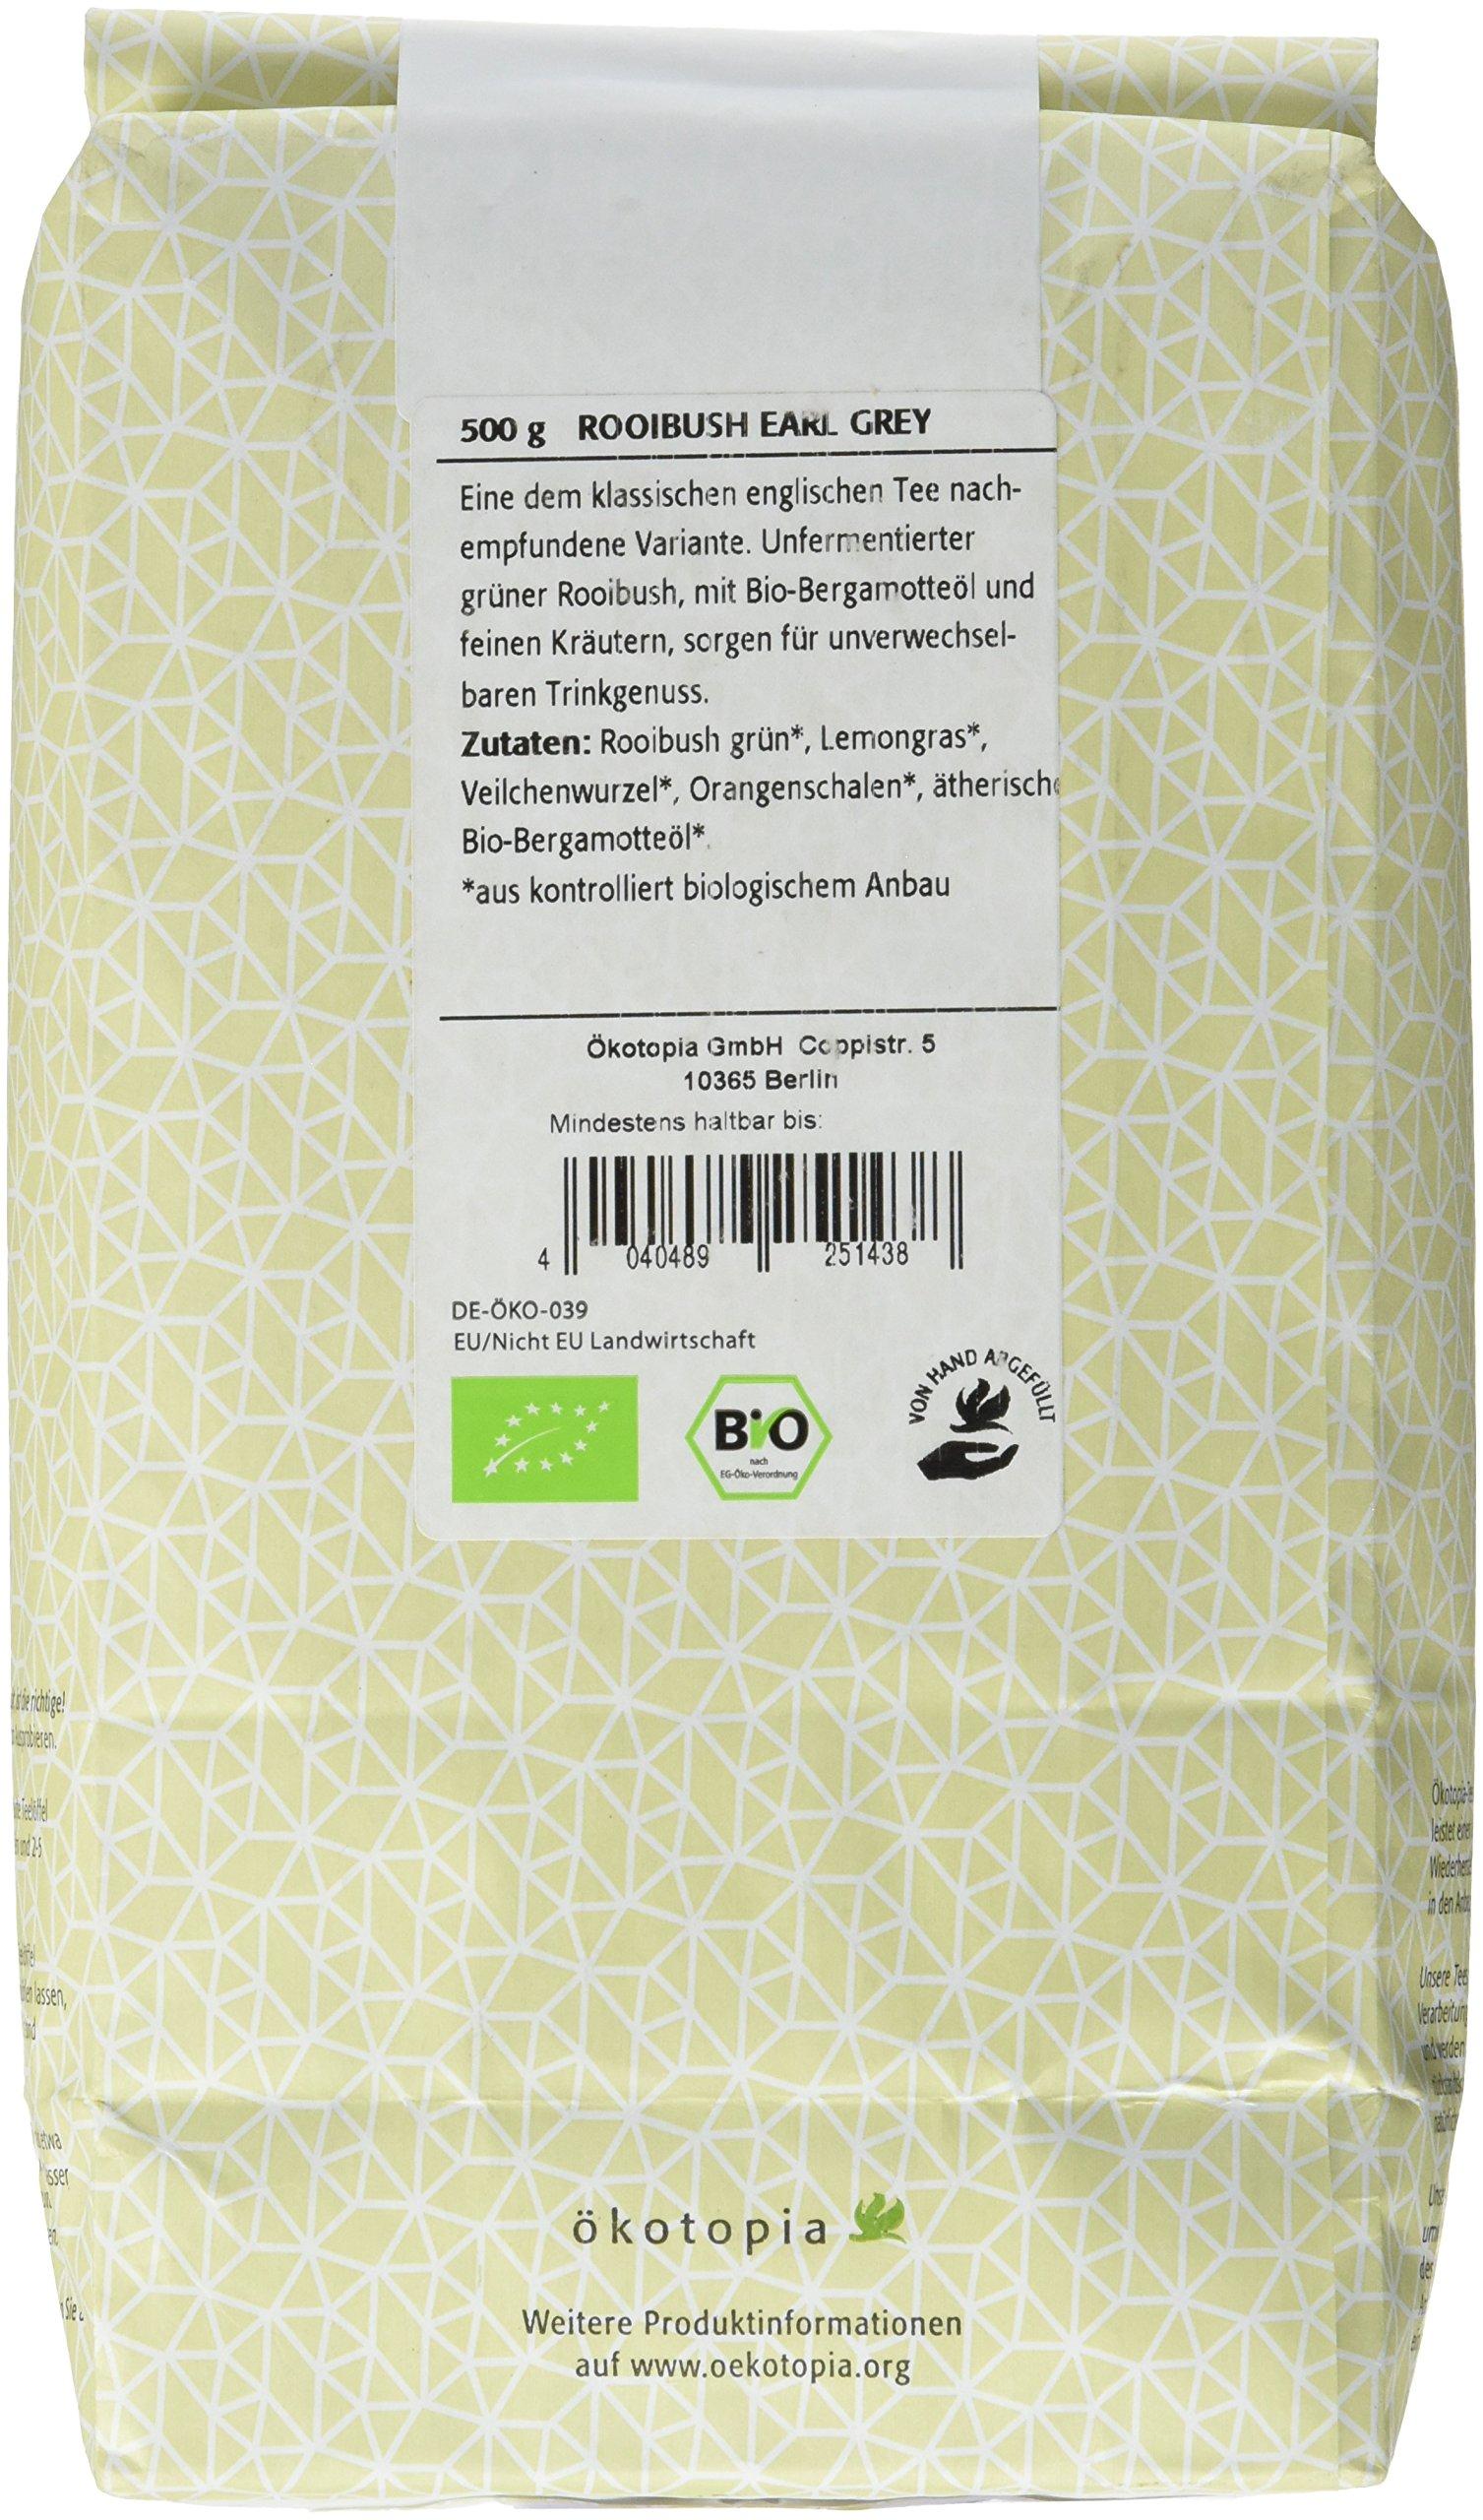 kotopia-Roibusch-Tee-aromatisiert-Rooibush-Earl-Grey-1er-Pack-1-x-500-g